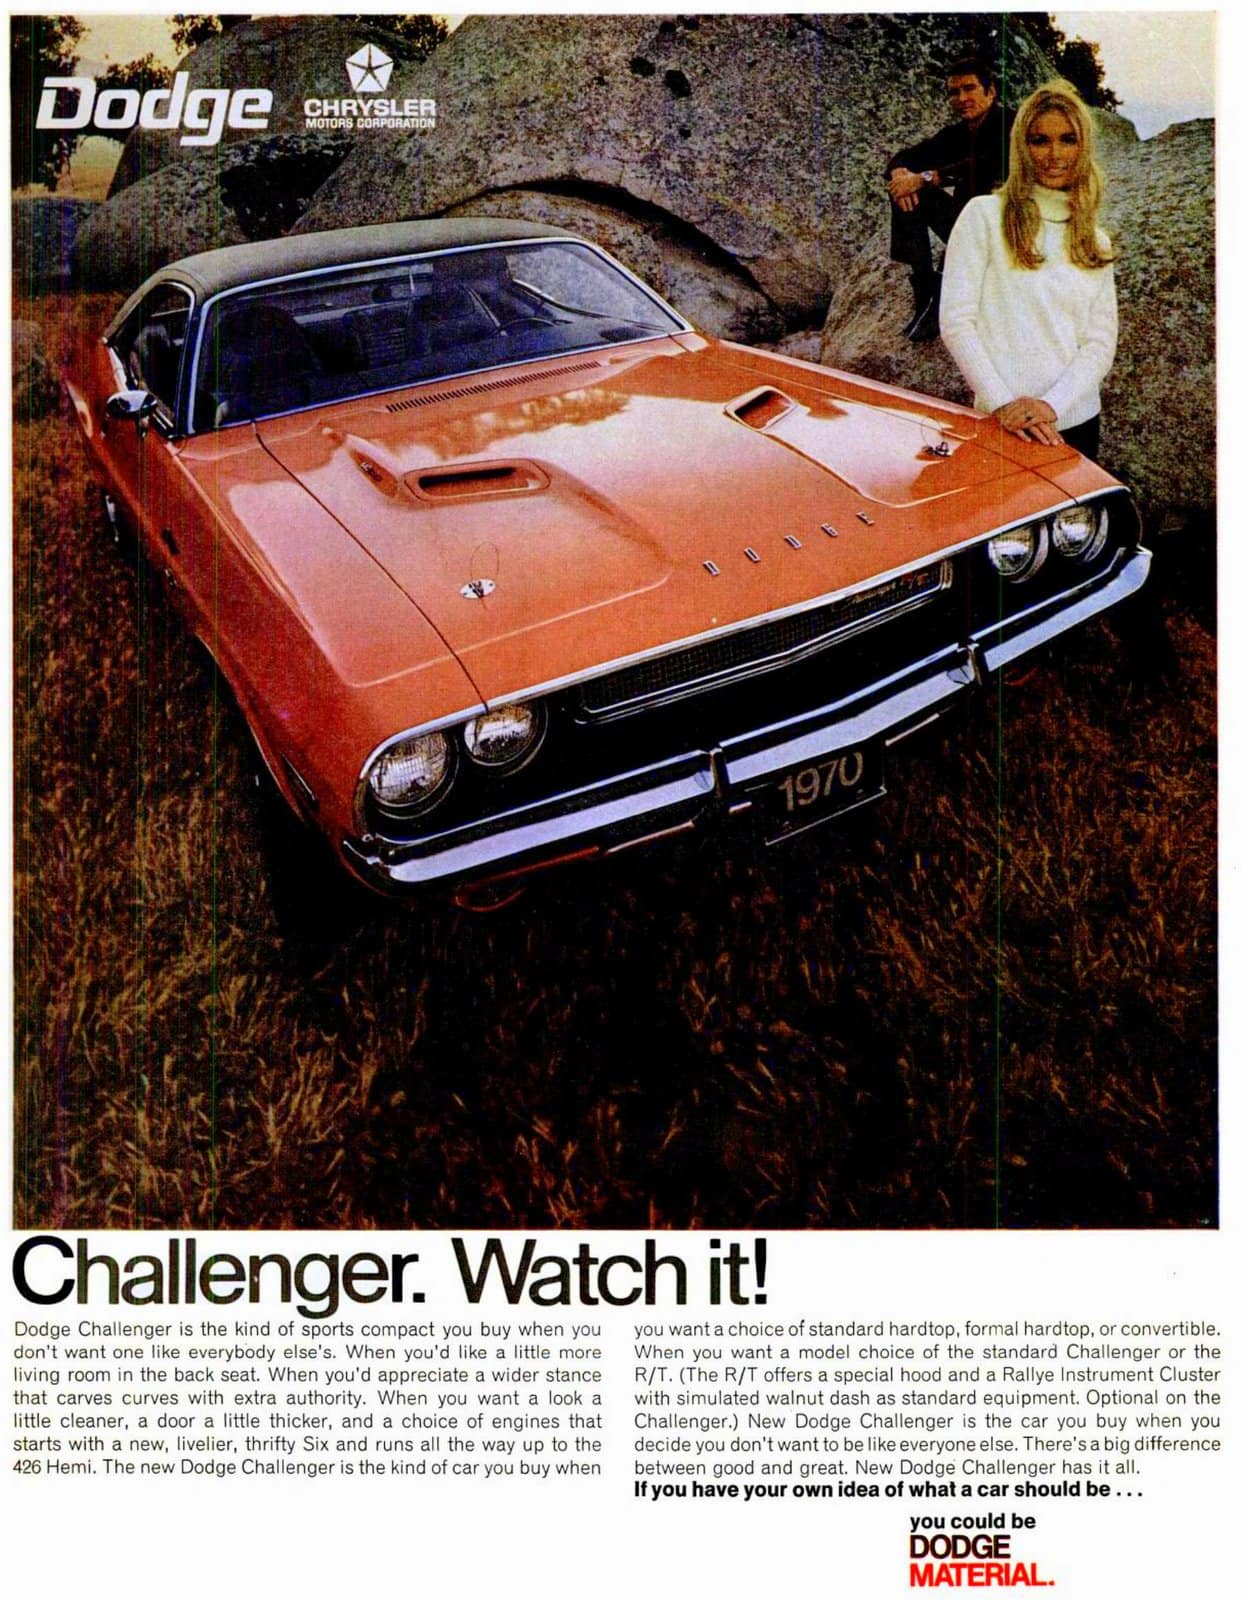 1970 Dodge Challenger cars